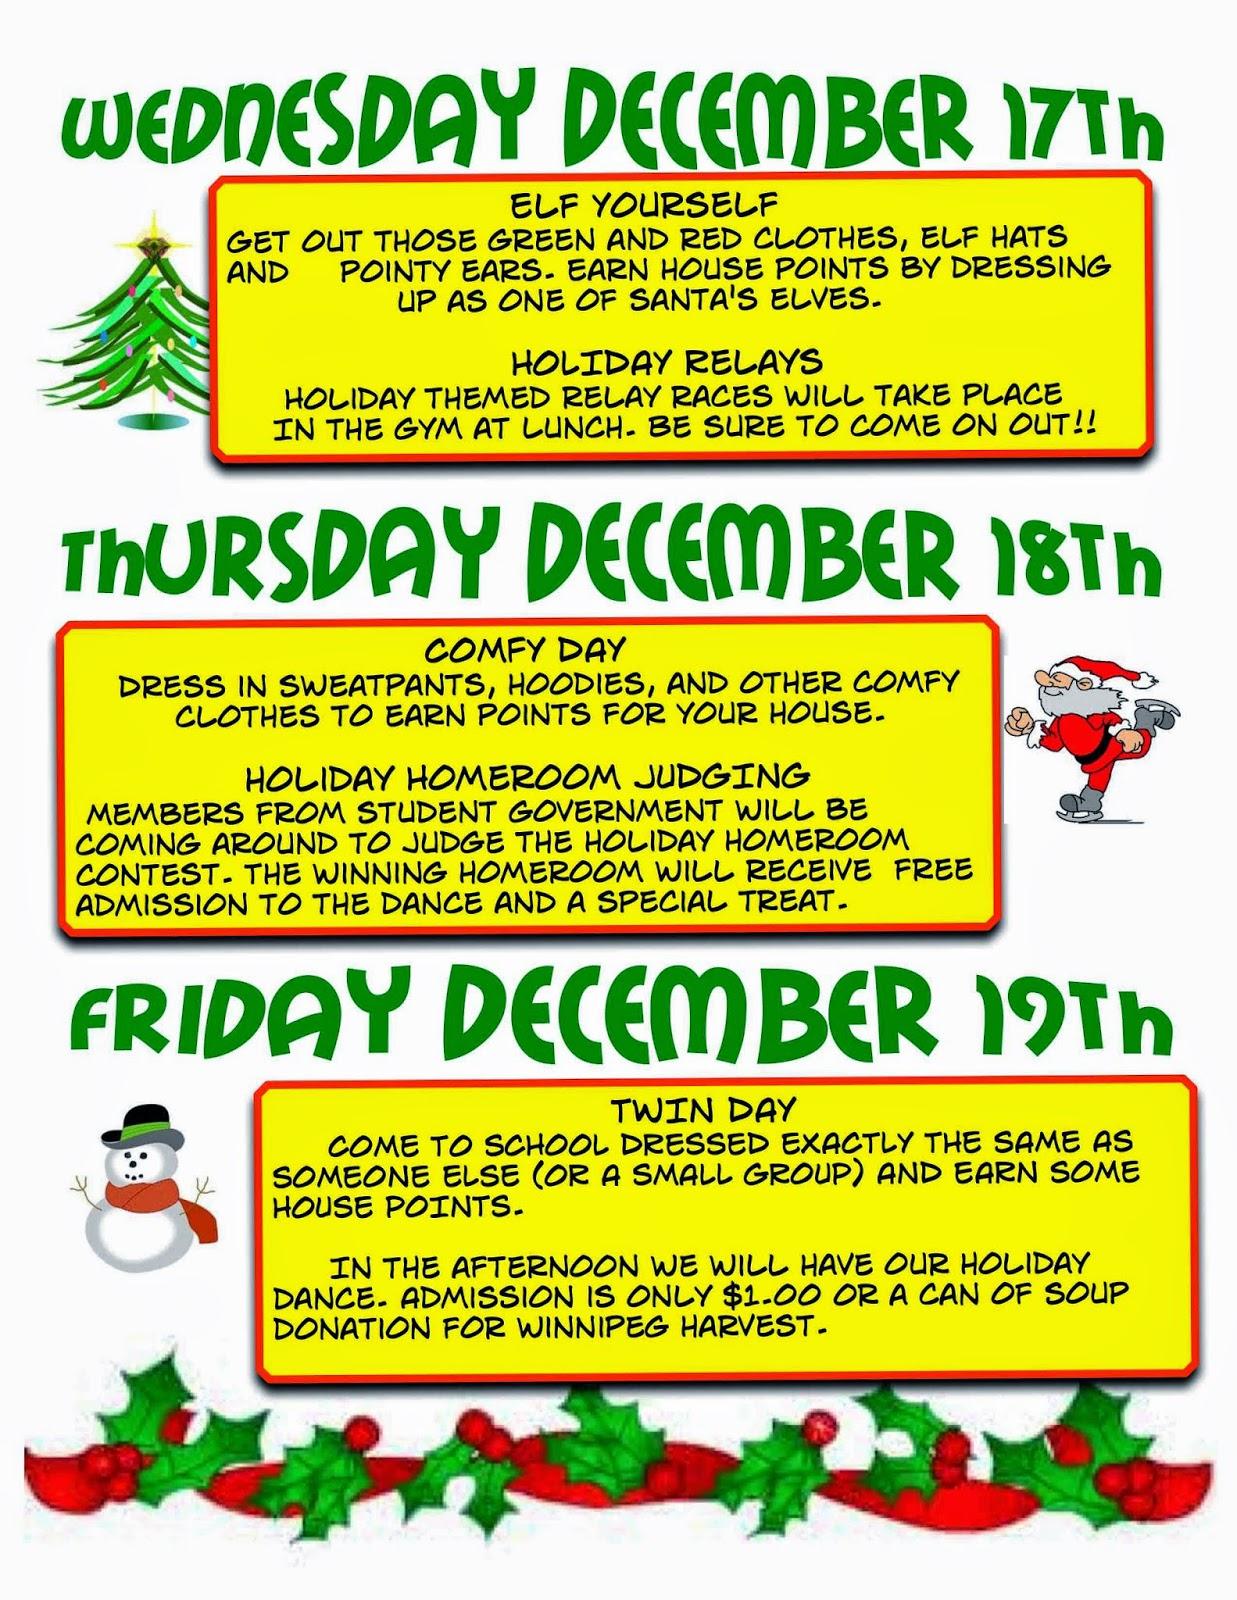 Holiday spirit dress up days images